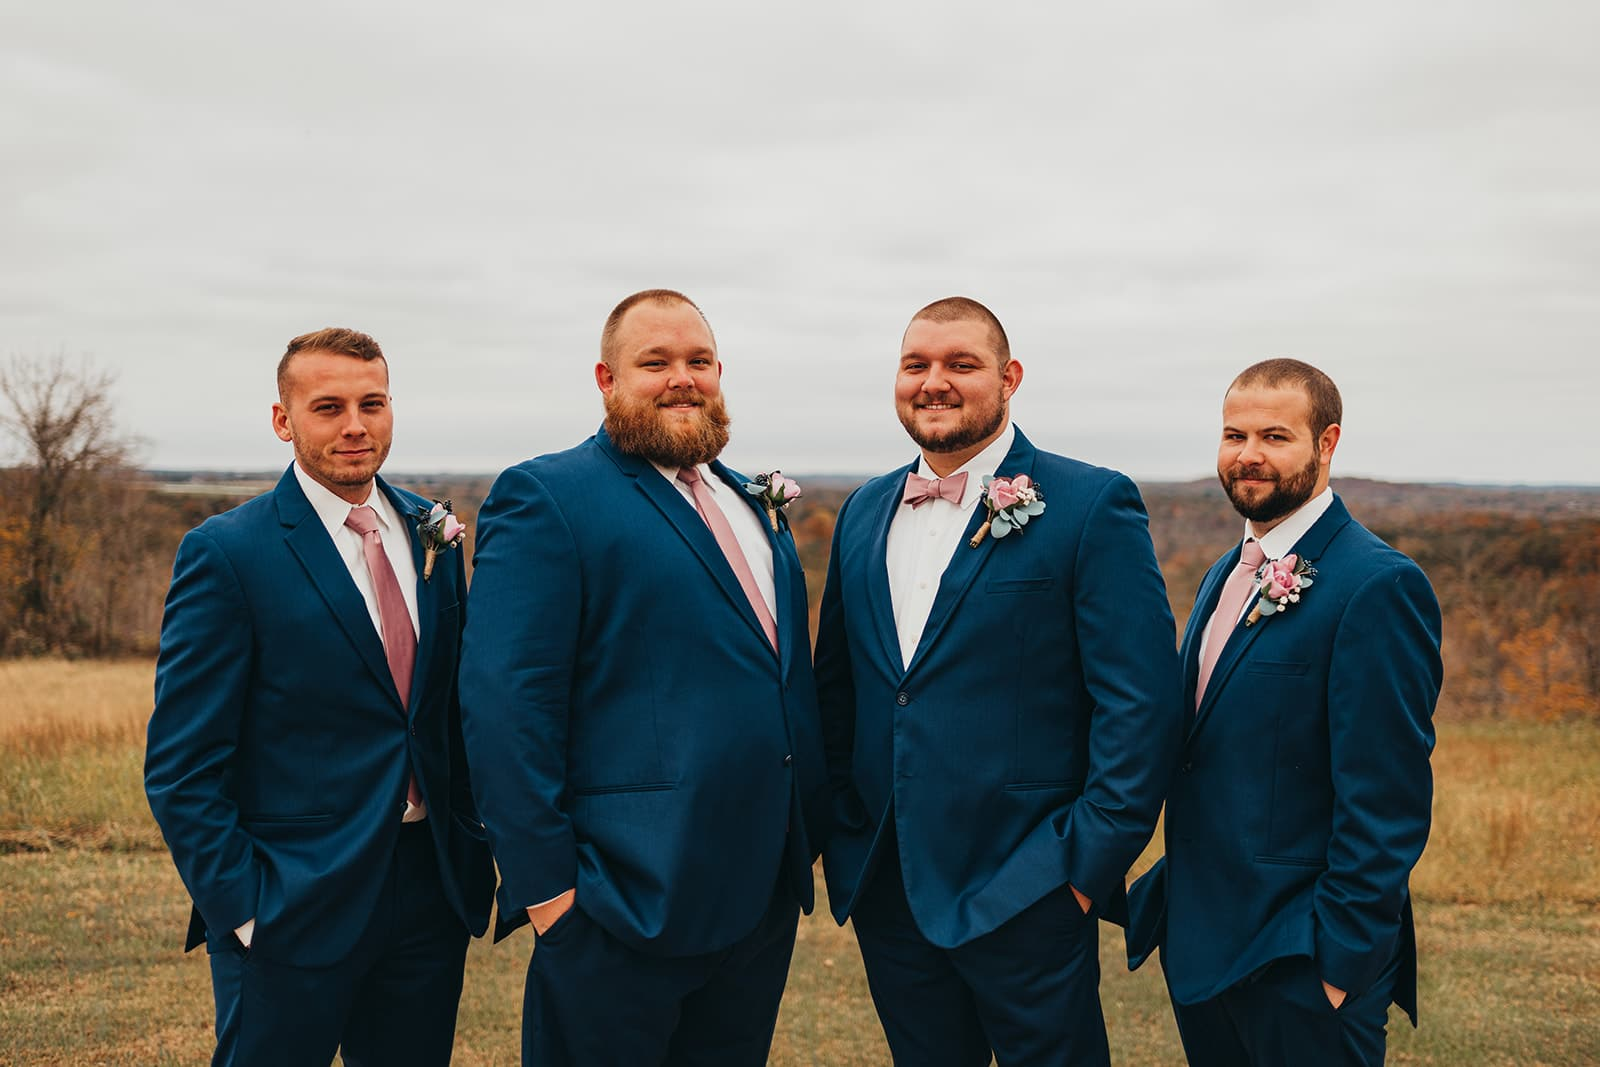 Blue Michael Kors wedding tuxedos